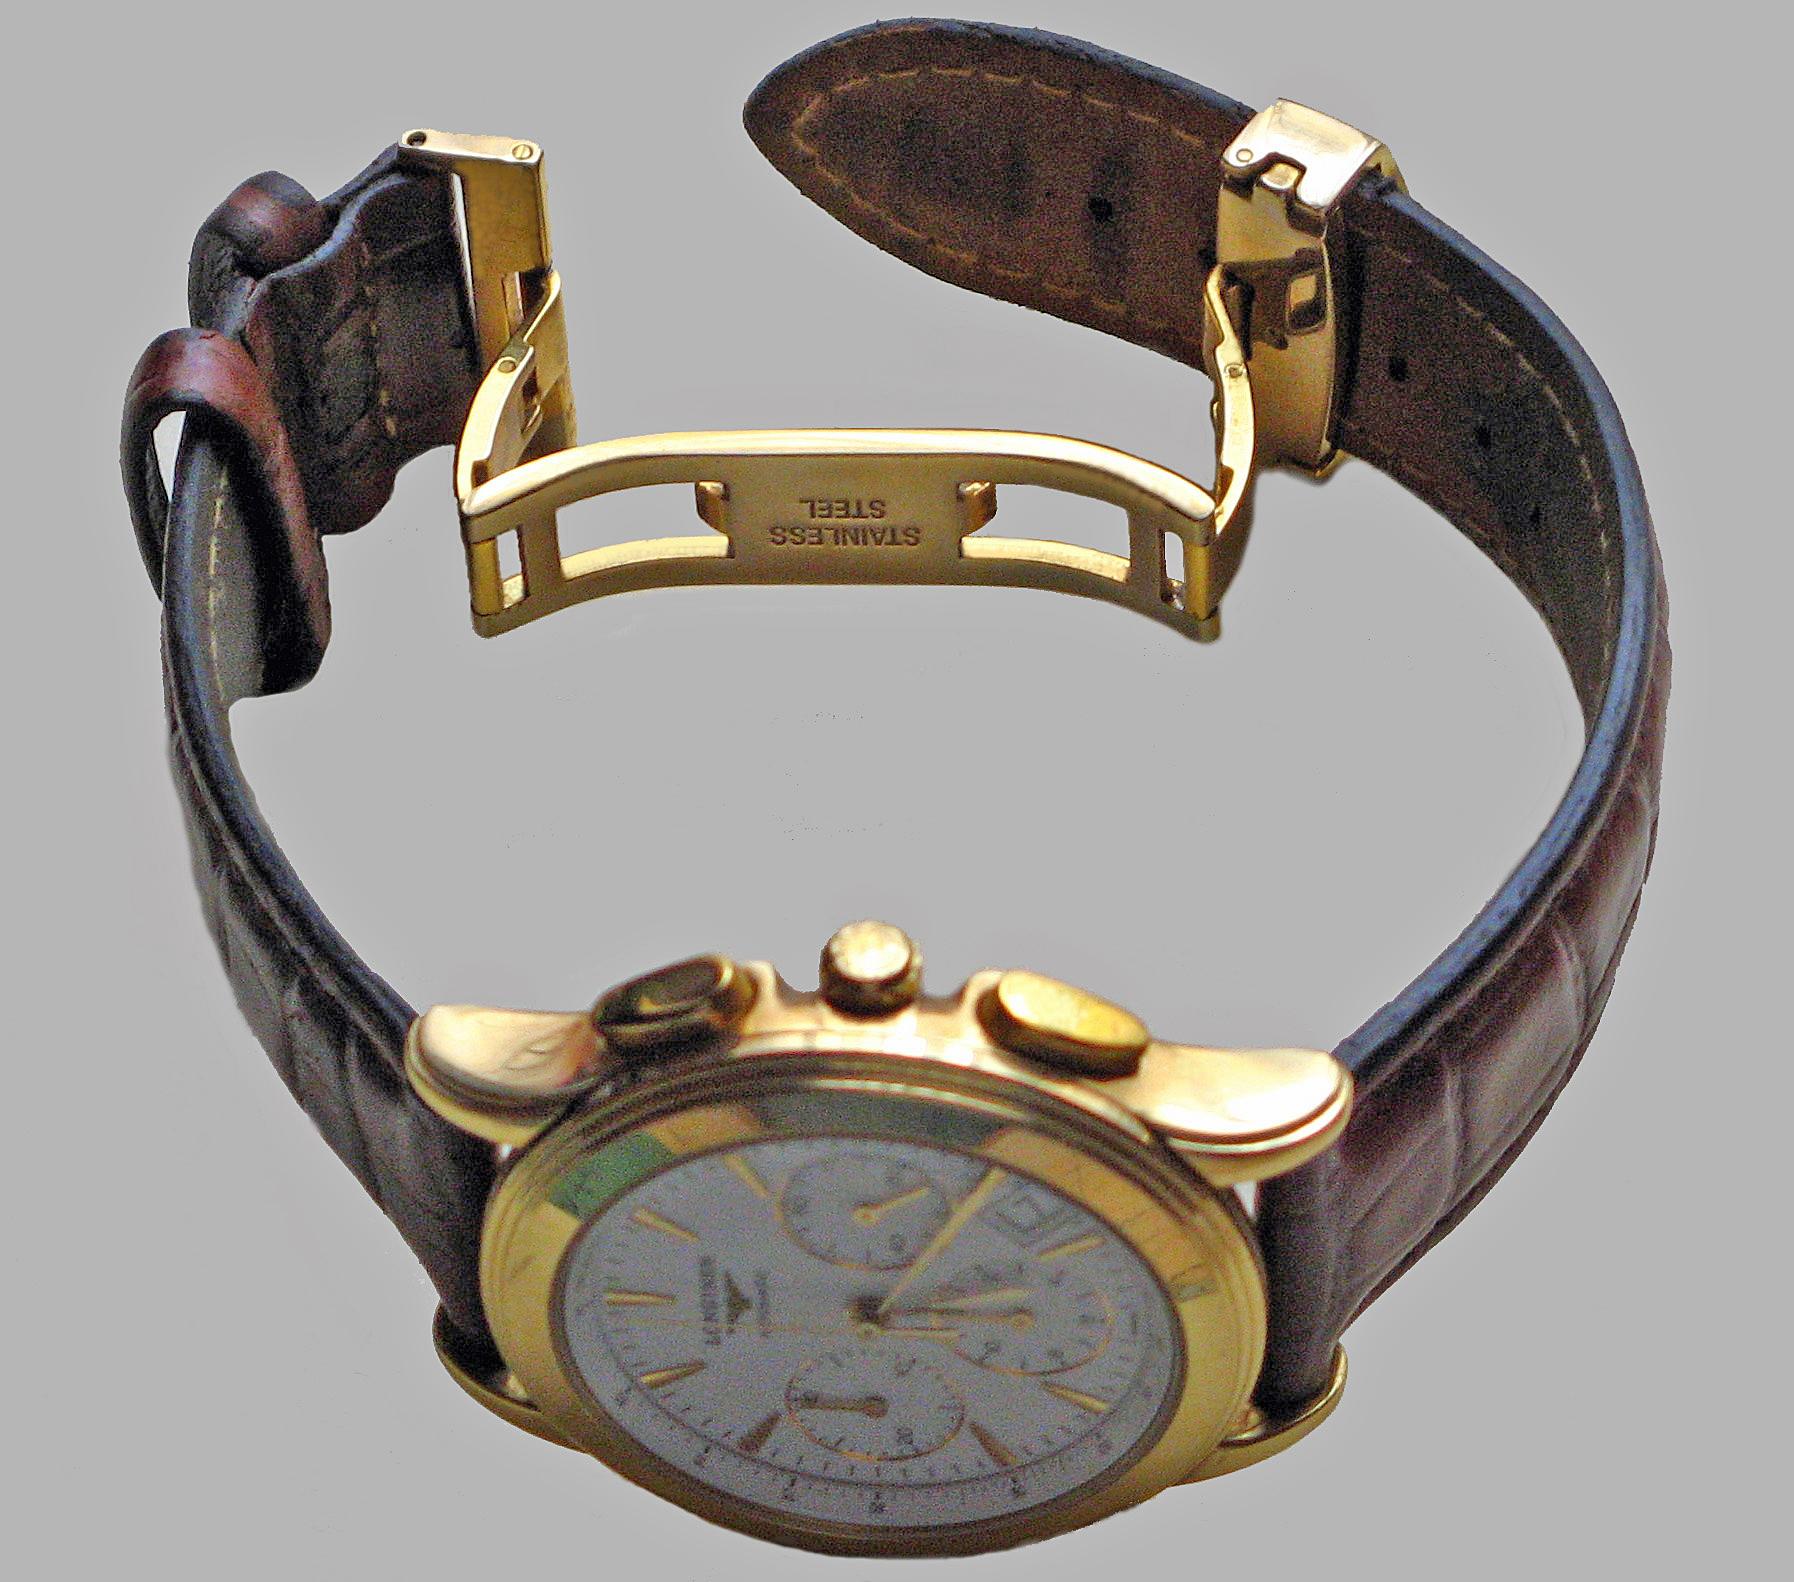 Leather Straps Bracelet Black Fashion Casual Cross Wristband Y Blue